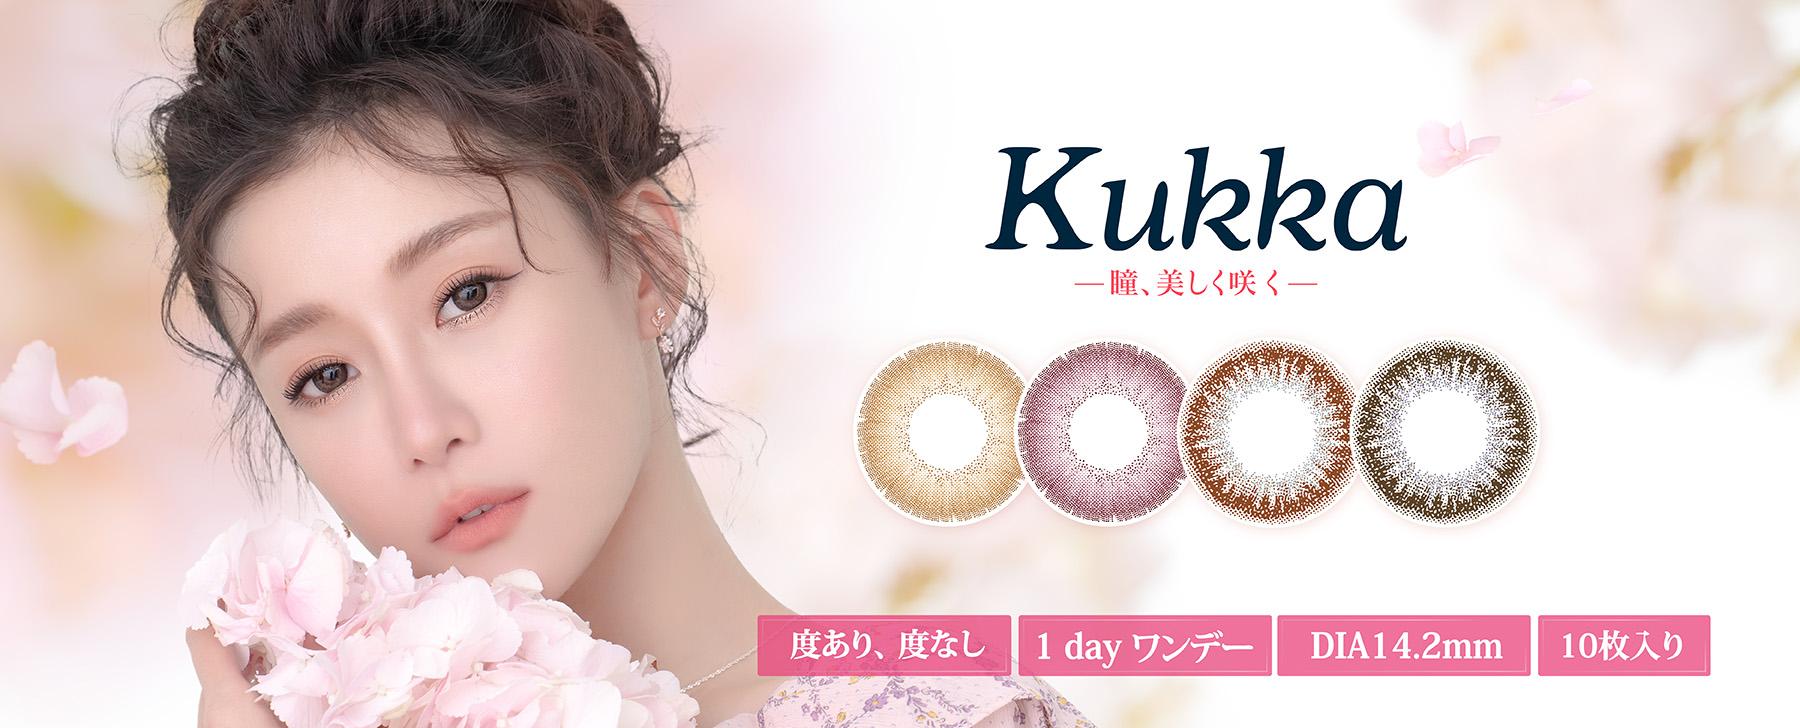 Kukka(クッカ)【度あり/度なし • ワンデー • DIA14.2】